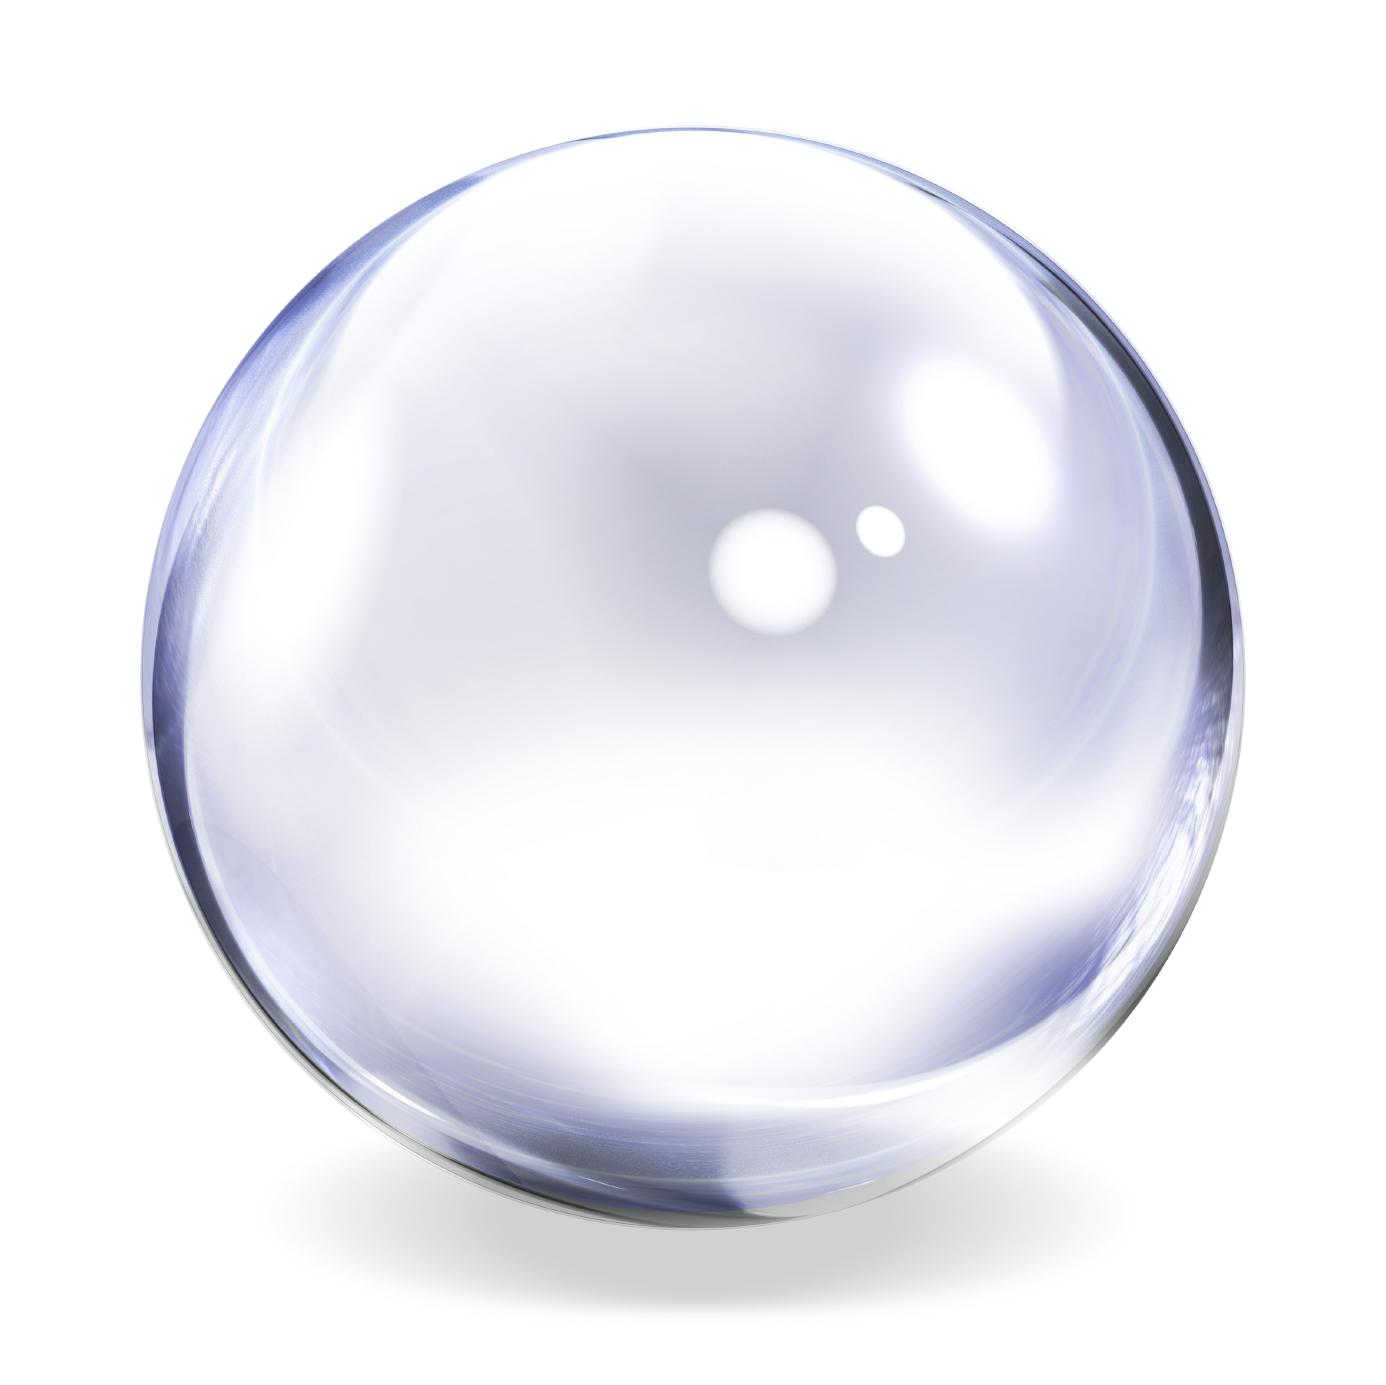 Bubble clipart soapy water Bubble Bubble White White Image